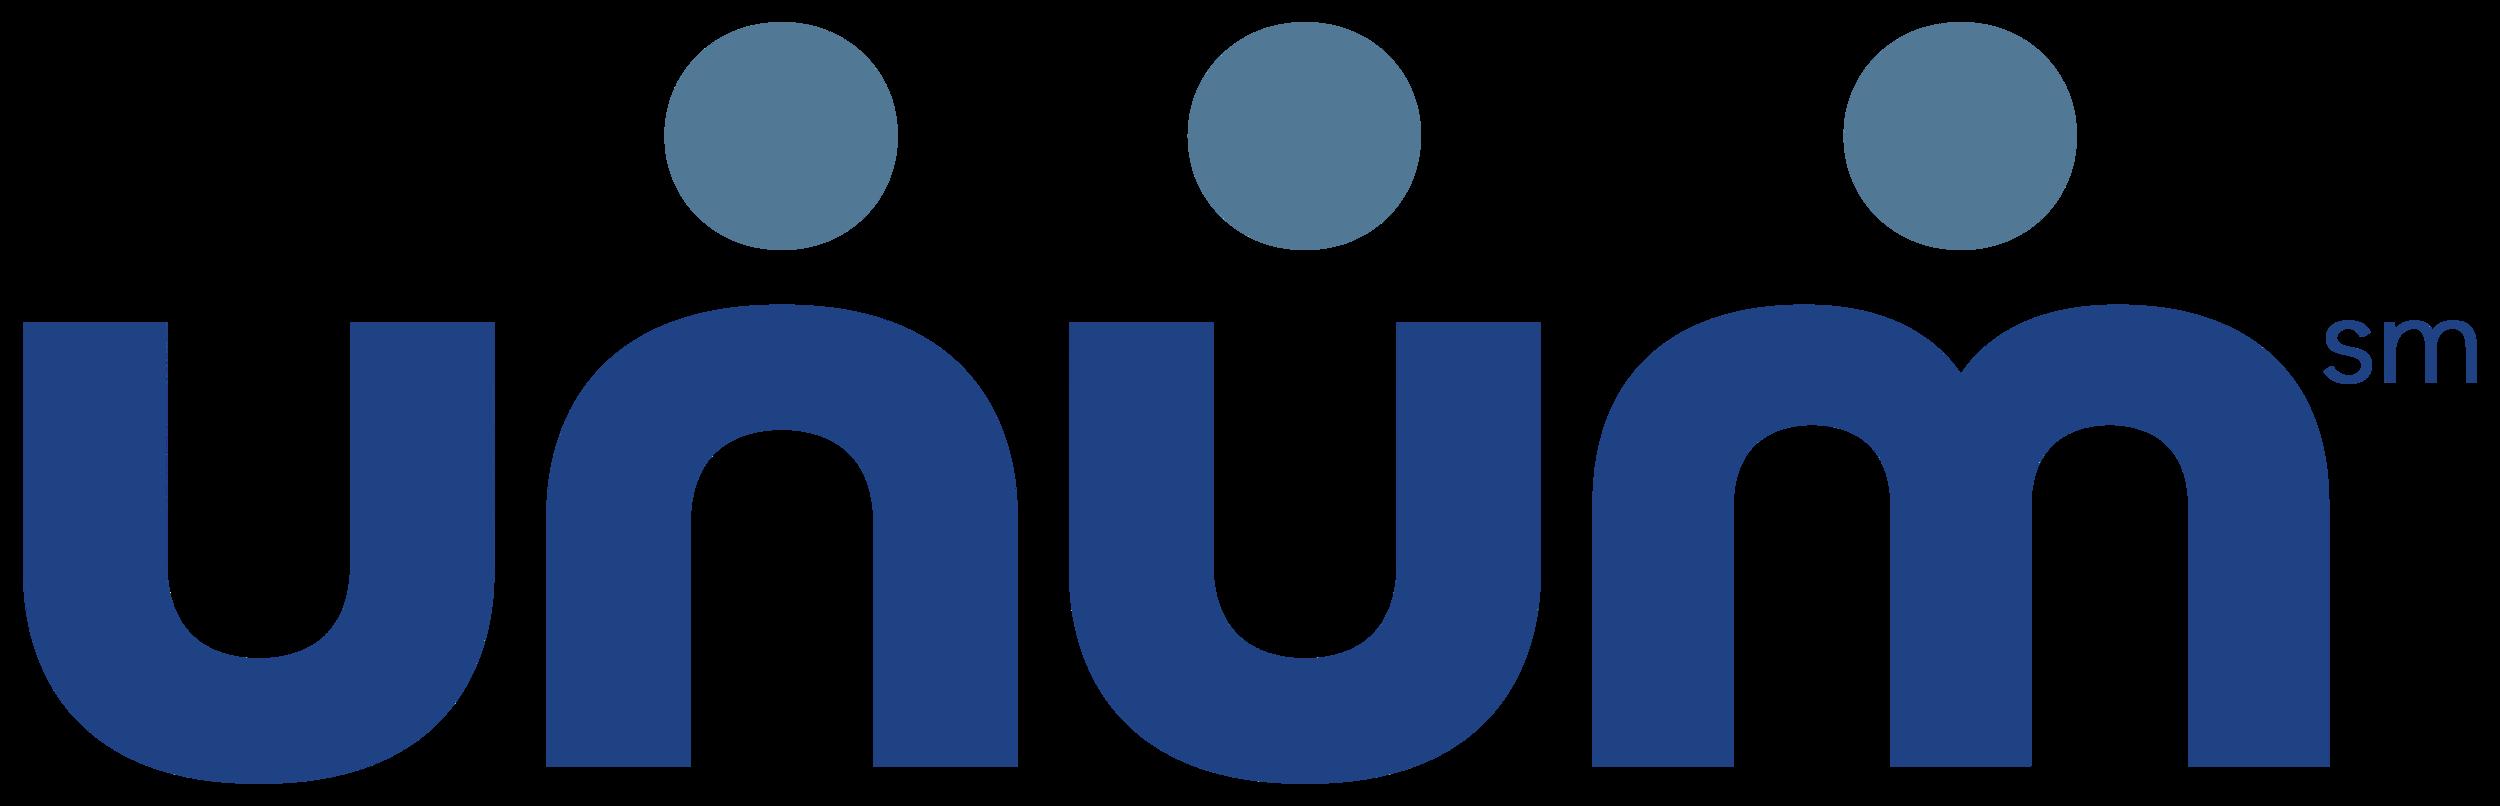 Glamorous-Unum-Logo-85-For-Create-A-Logo-with-Unum-Logo.jpg